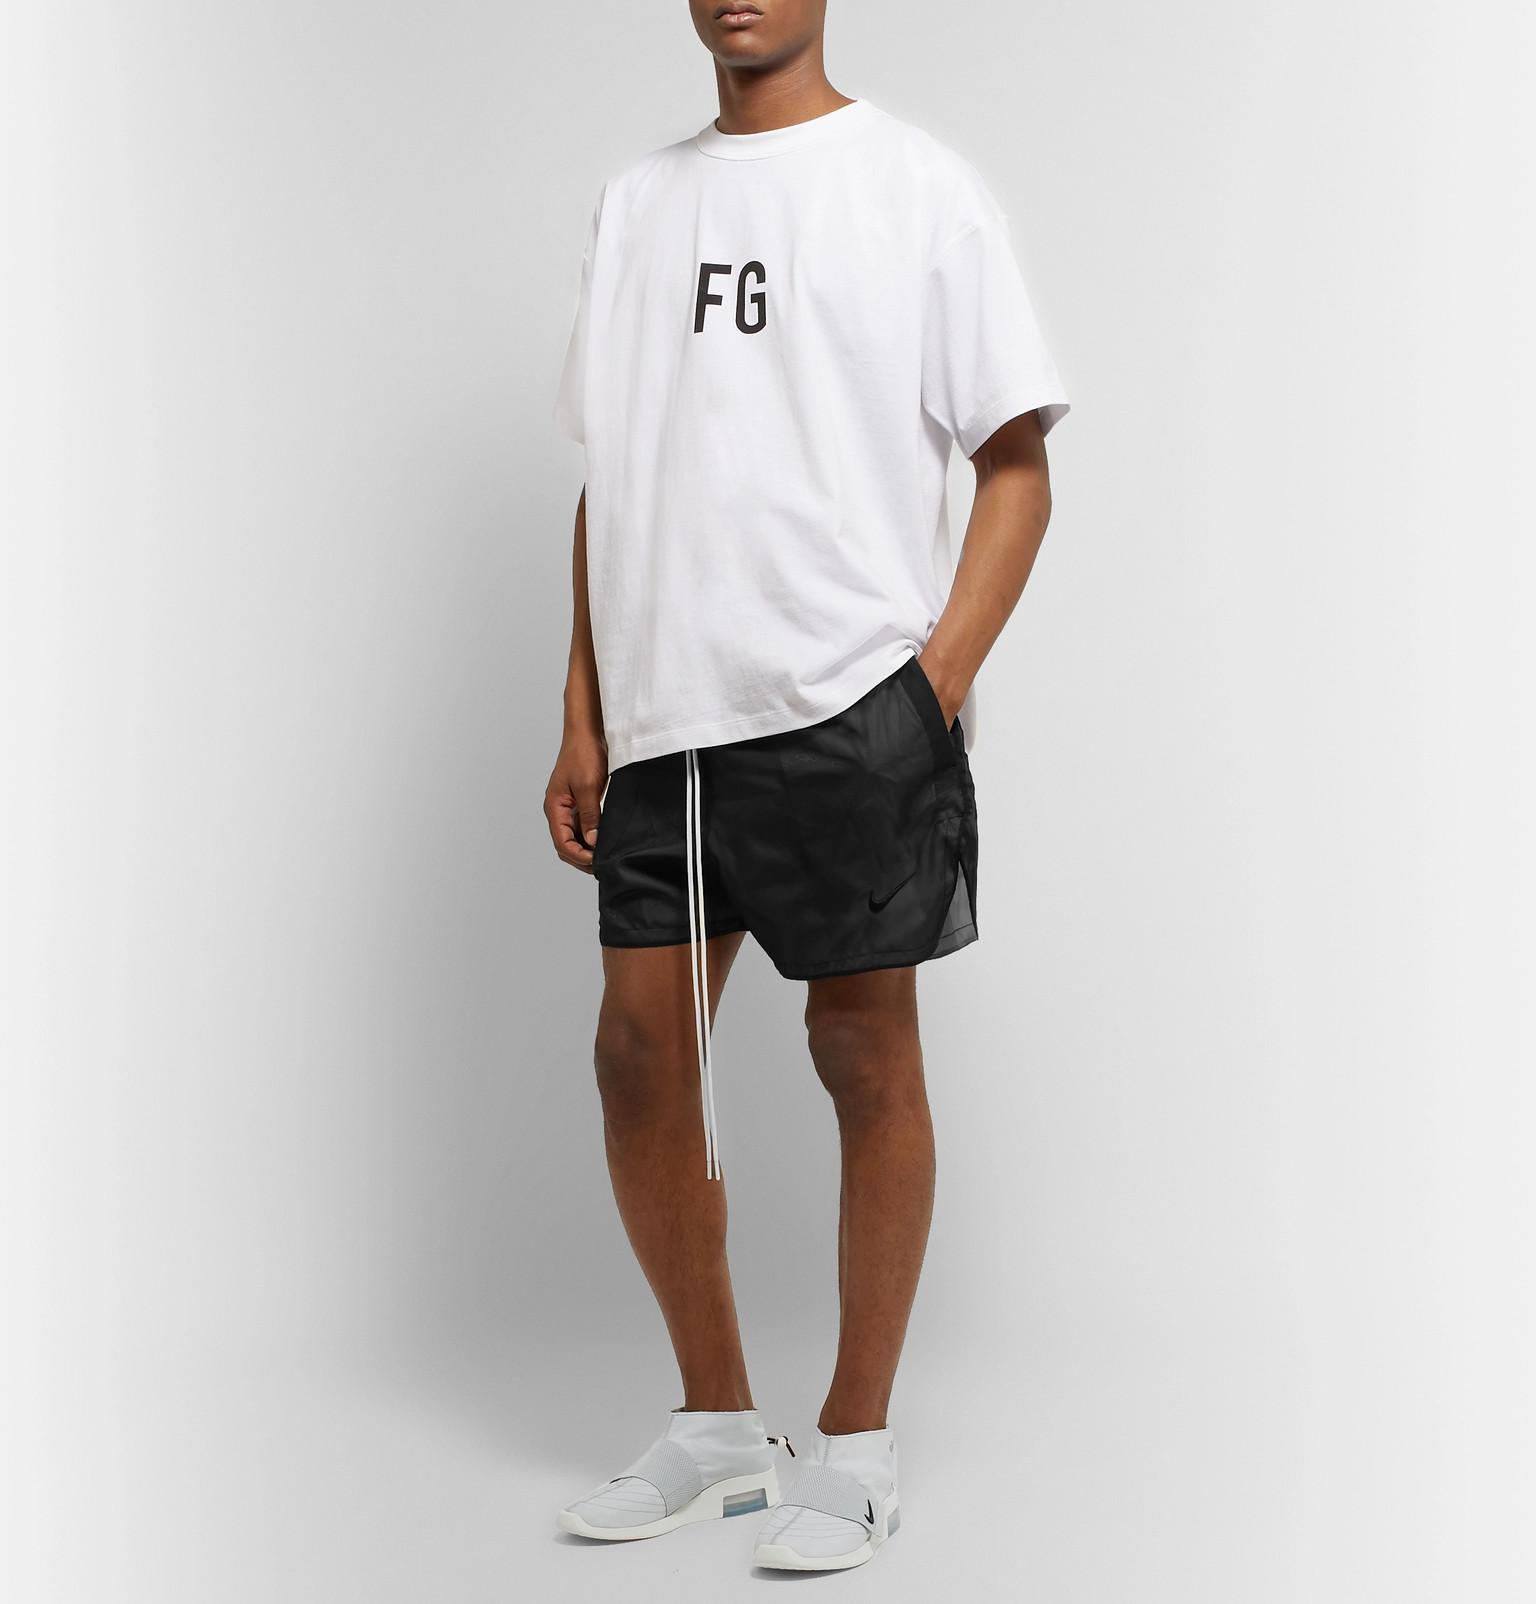 0fefcb87 Nike - + Fear of God Air 1 Moccasin Ripstop Sneakers